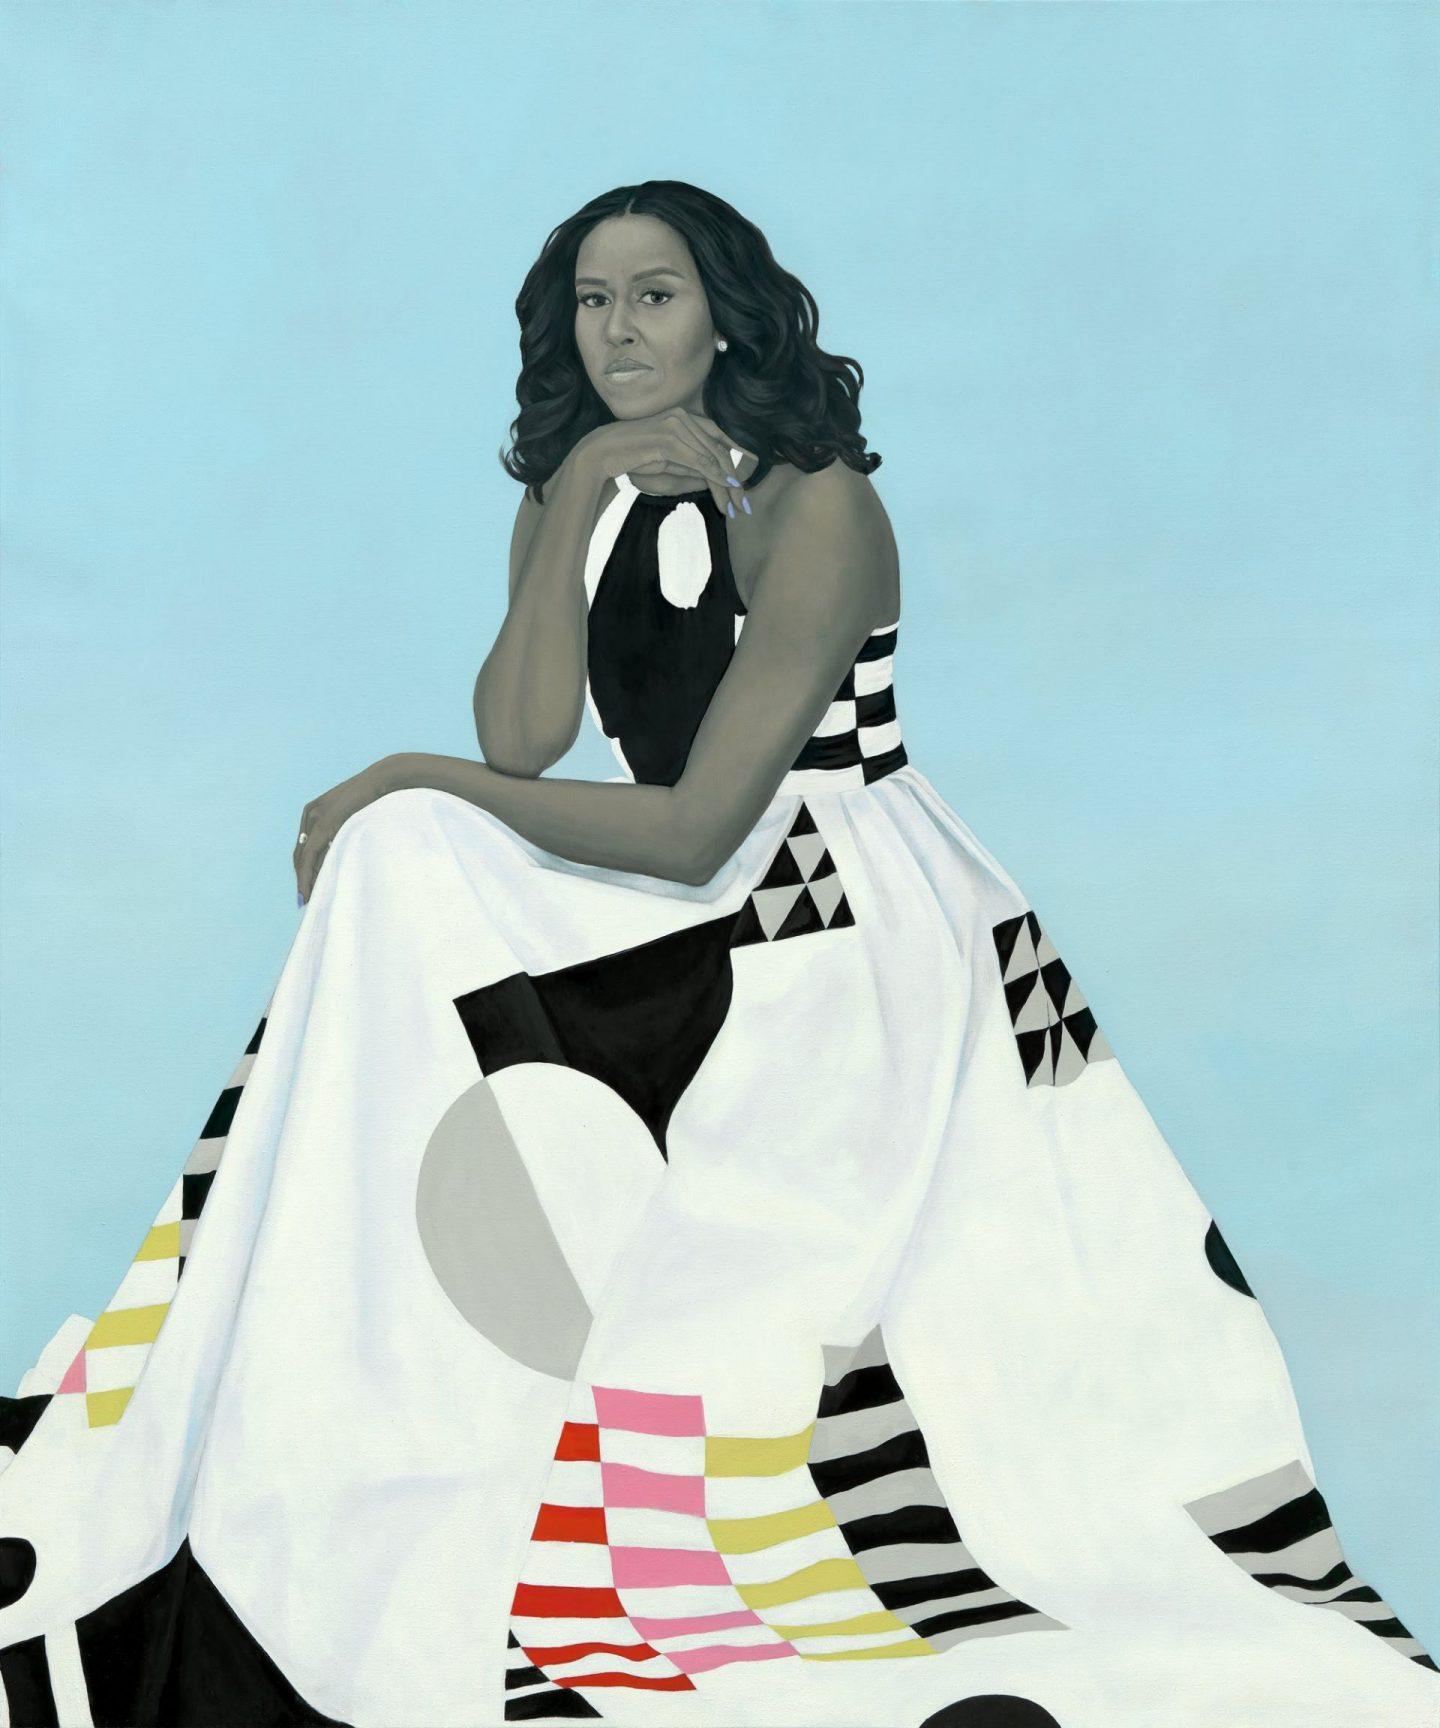 Obama Portraits Tour (High Museum of Art)